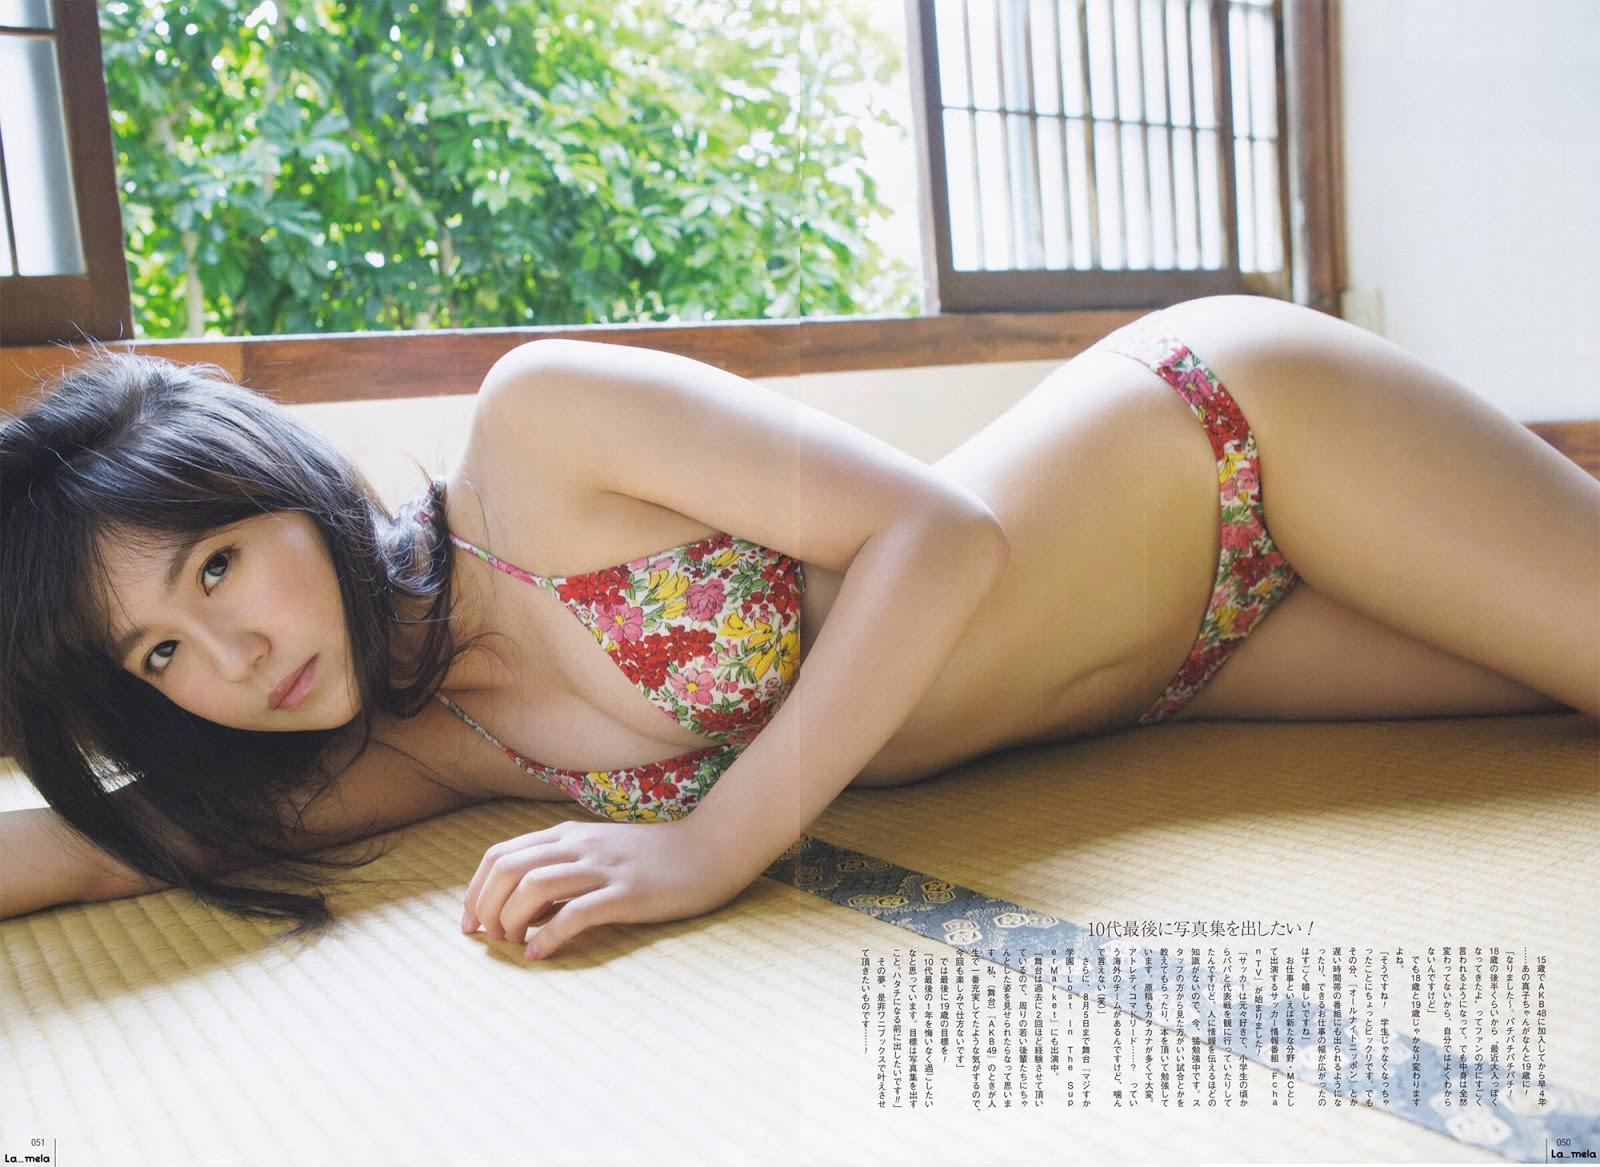 Kojima Mako 小嶋真子 AKB48, UTB Magazine 2016.09 Vol.245 Gravure